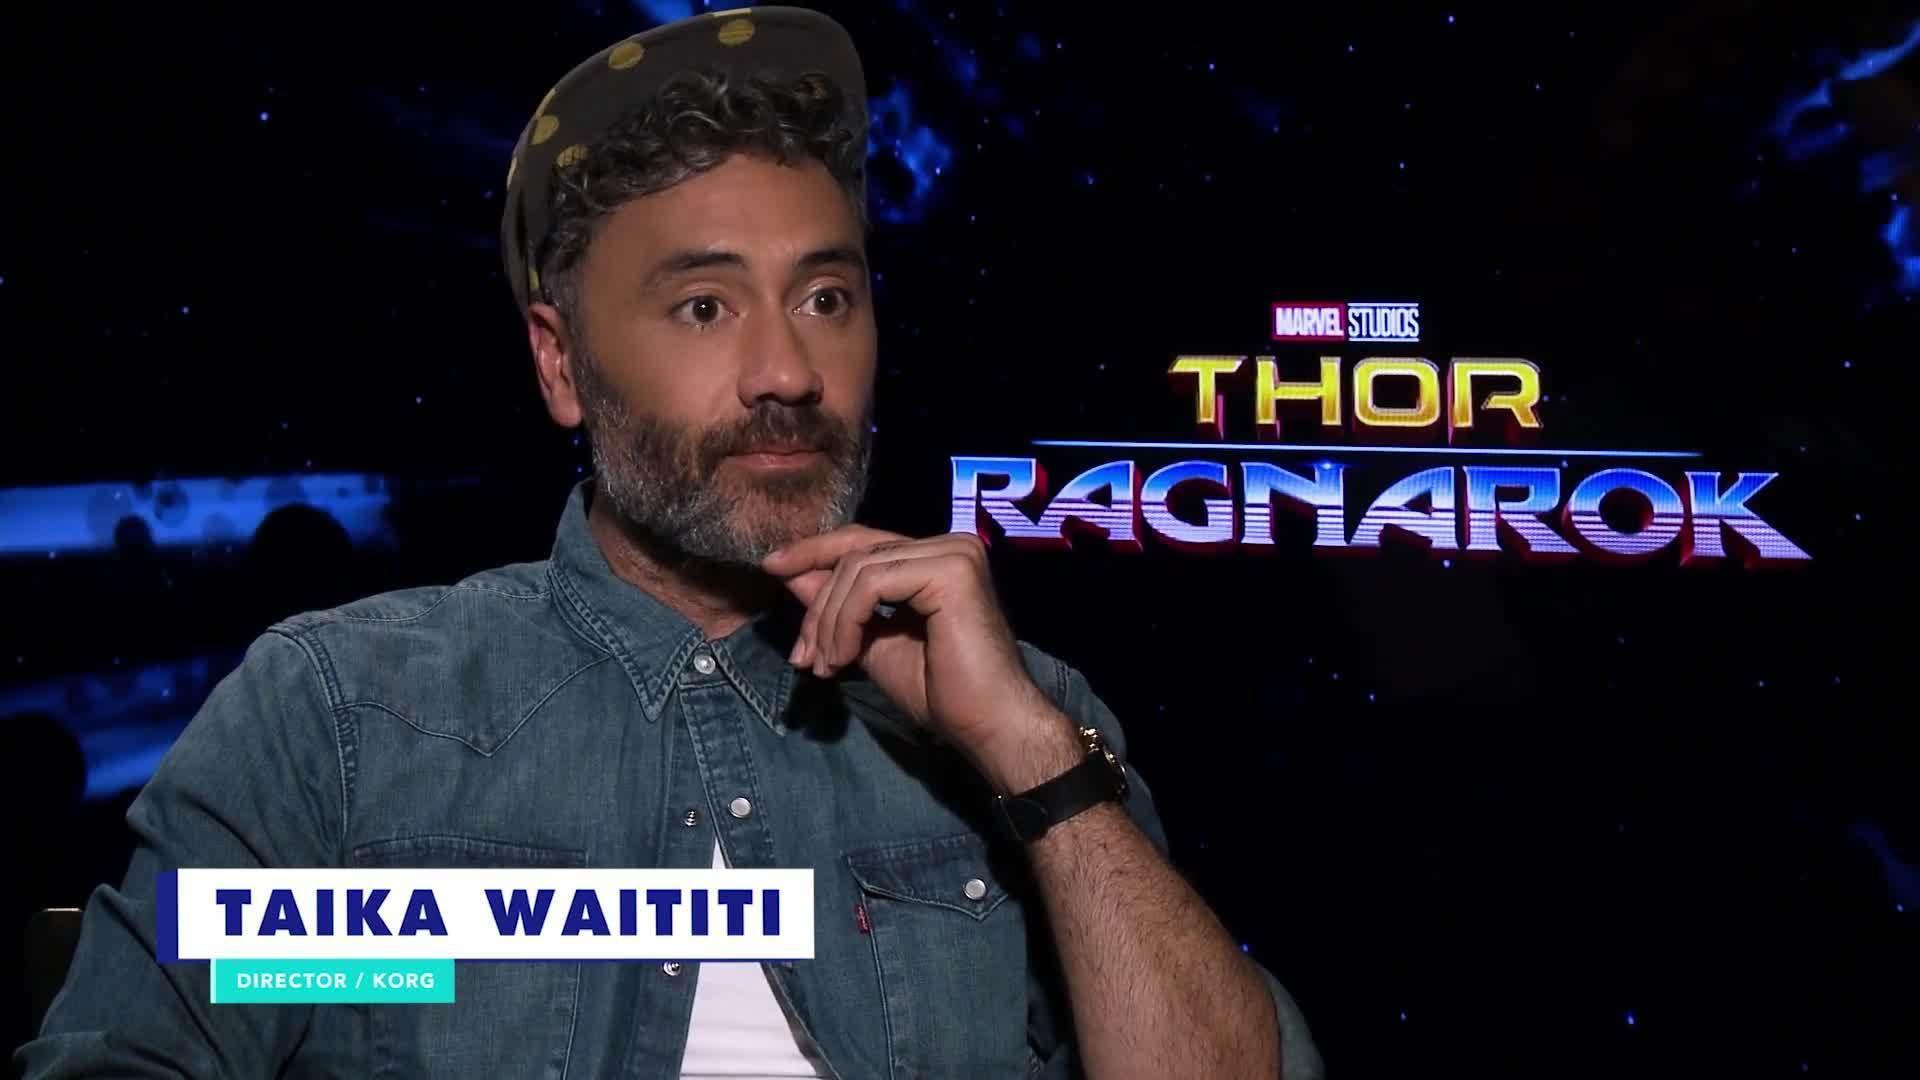 Taika Waititi Talks About Directing Thor: Ragnarok | Oh My Disney Show